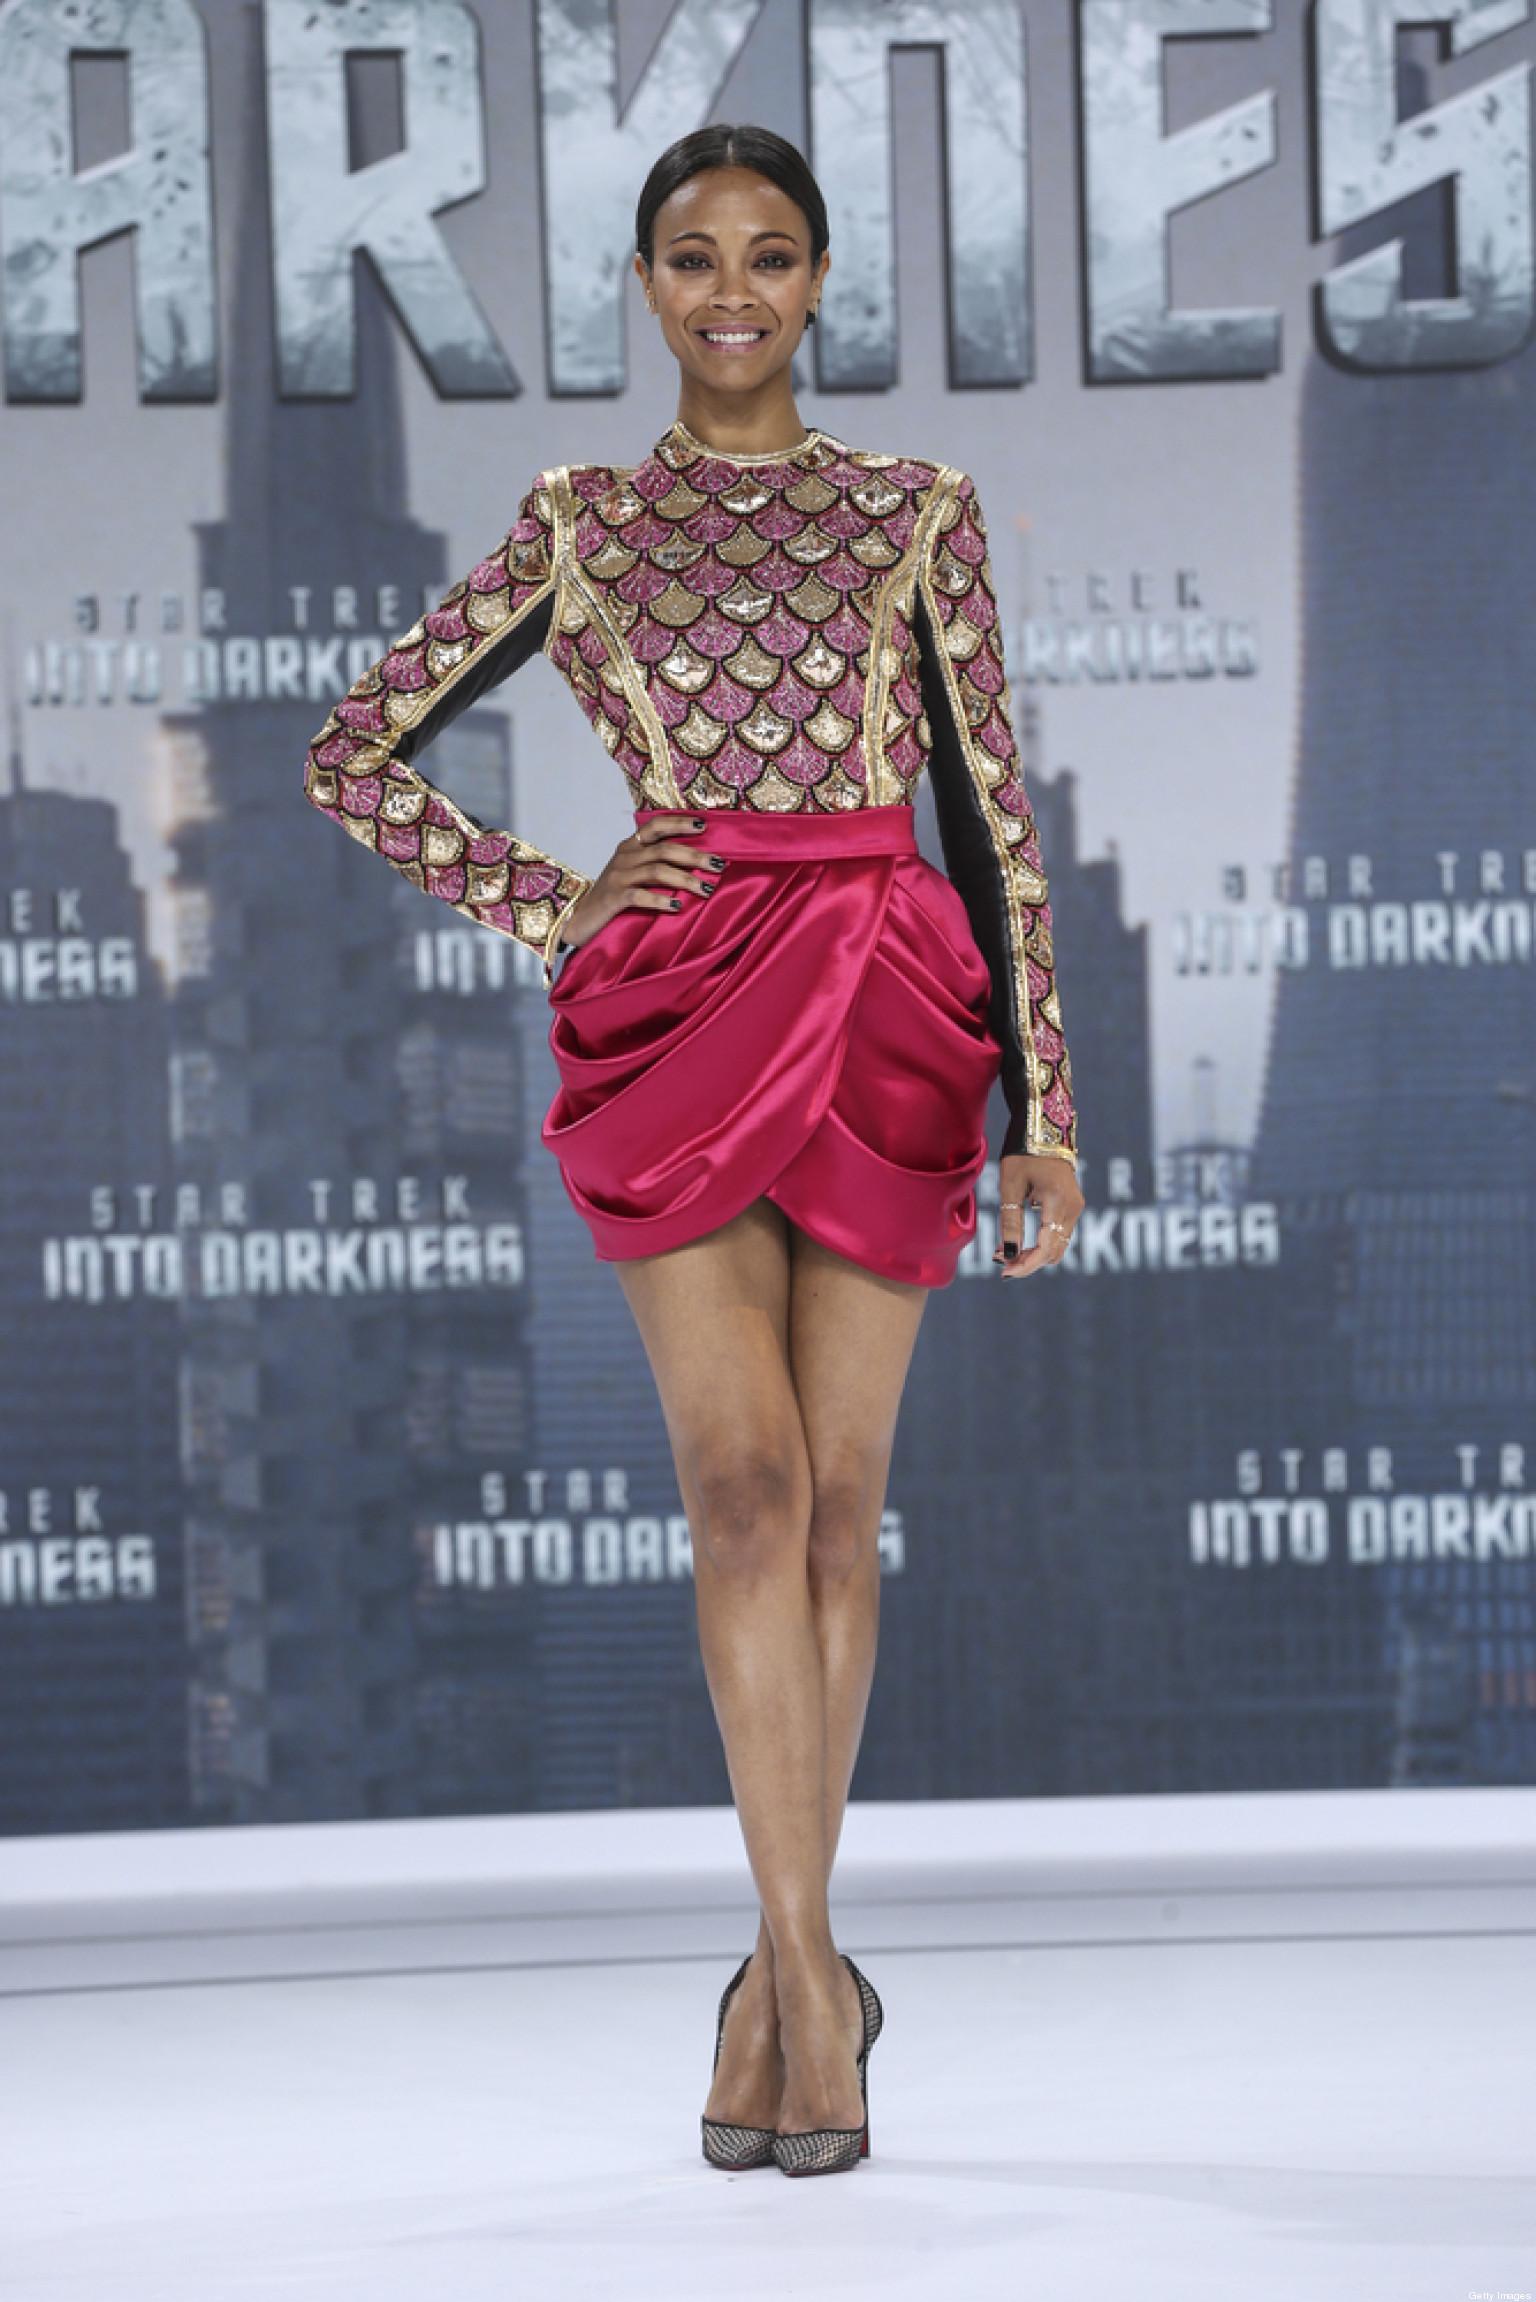 Zoe Saldana Sophisticated In A Balmain Dress At The